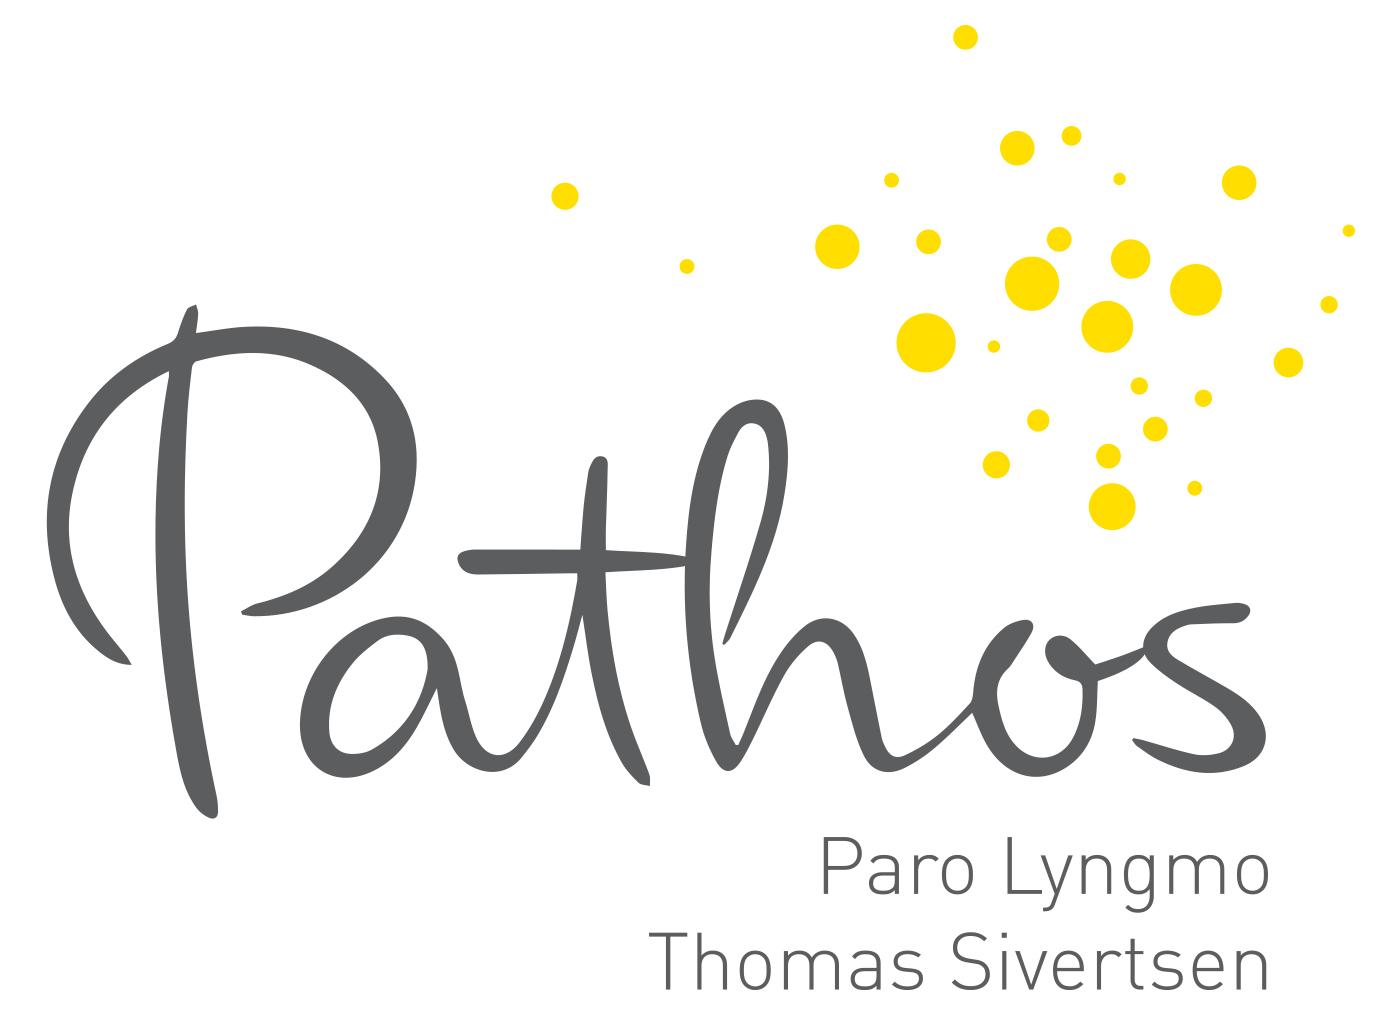 Logo Pathos